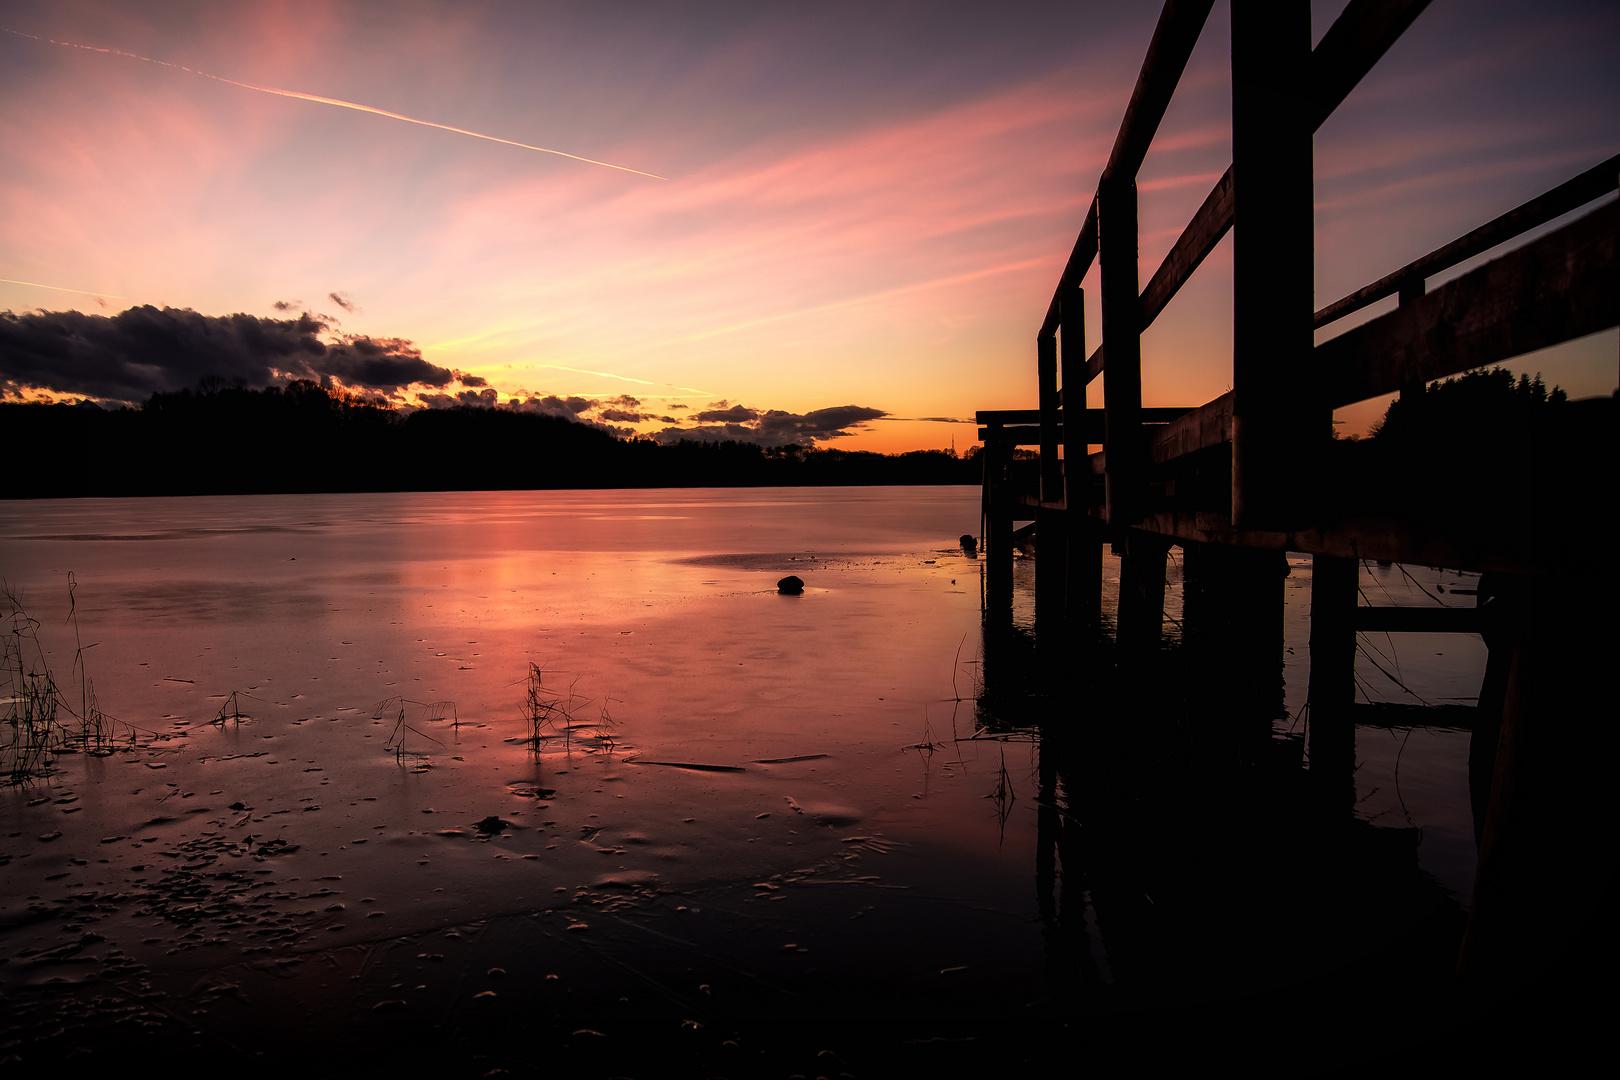 Sonnenuntergang im Winter am Tinningersee